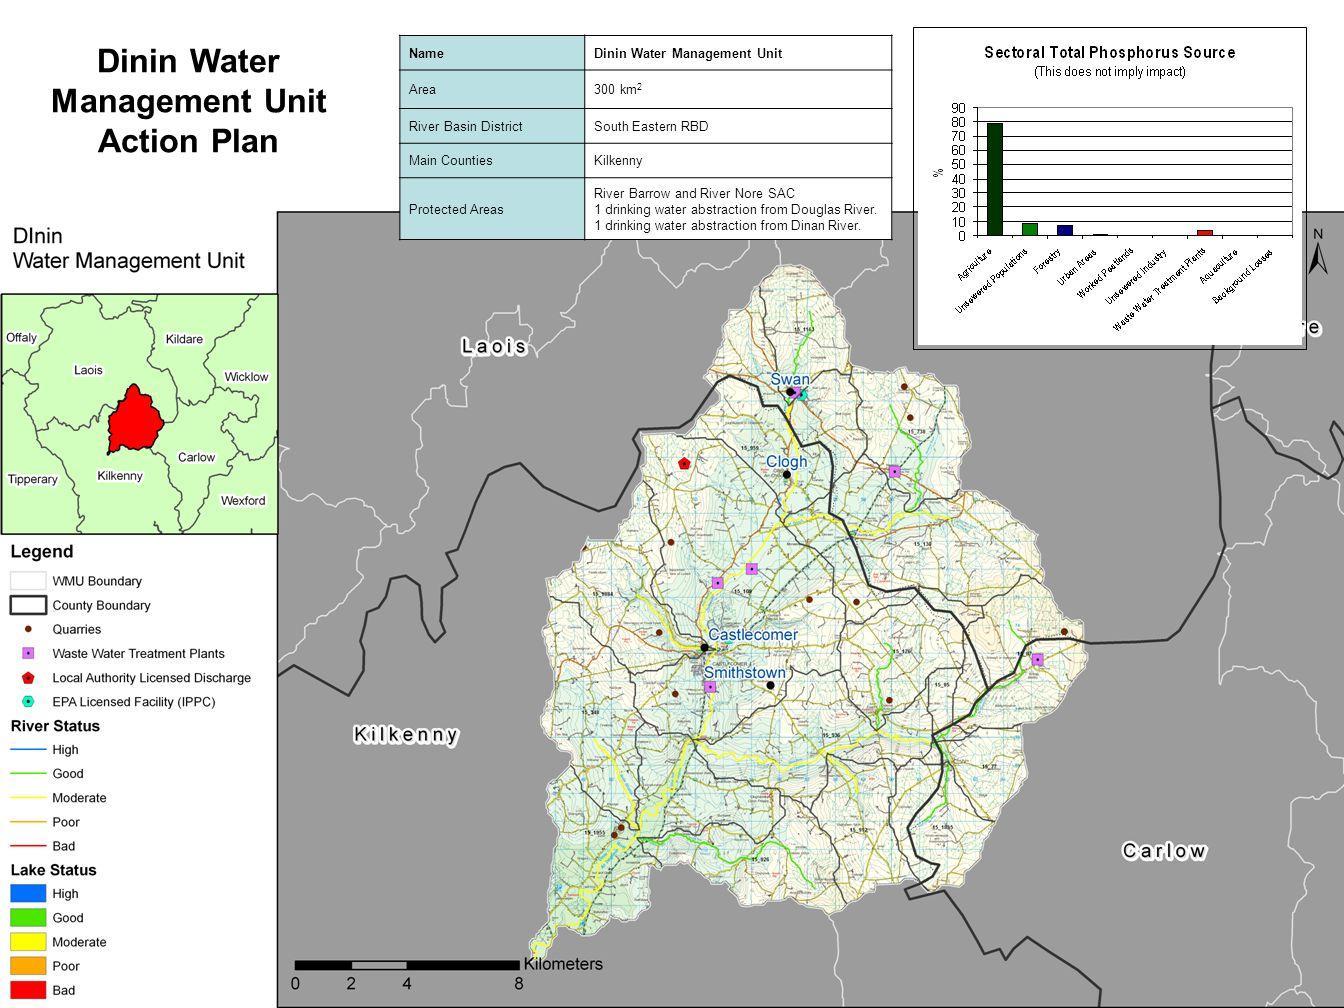 Dinin Water Management Unit Action Plan STATUS/IMPACTS Overall status16 RWB - 8 good, 8 moderate.